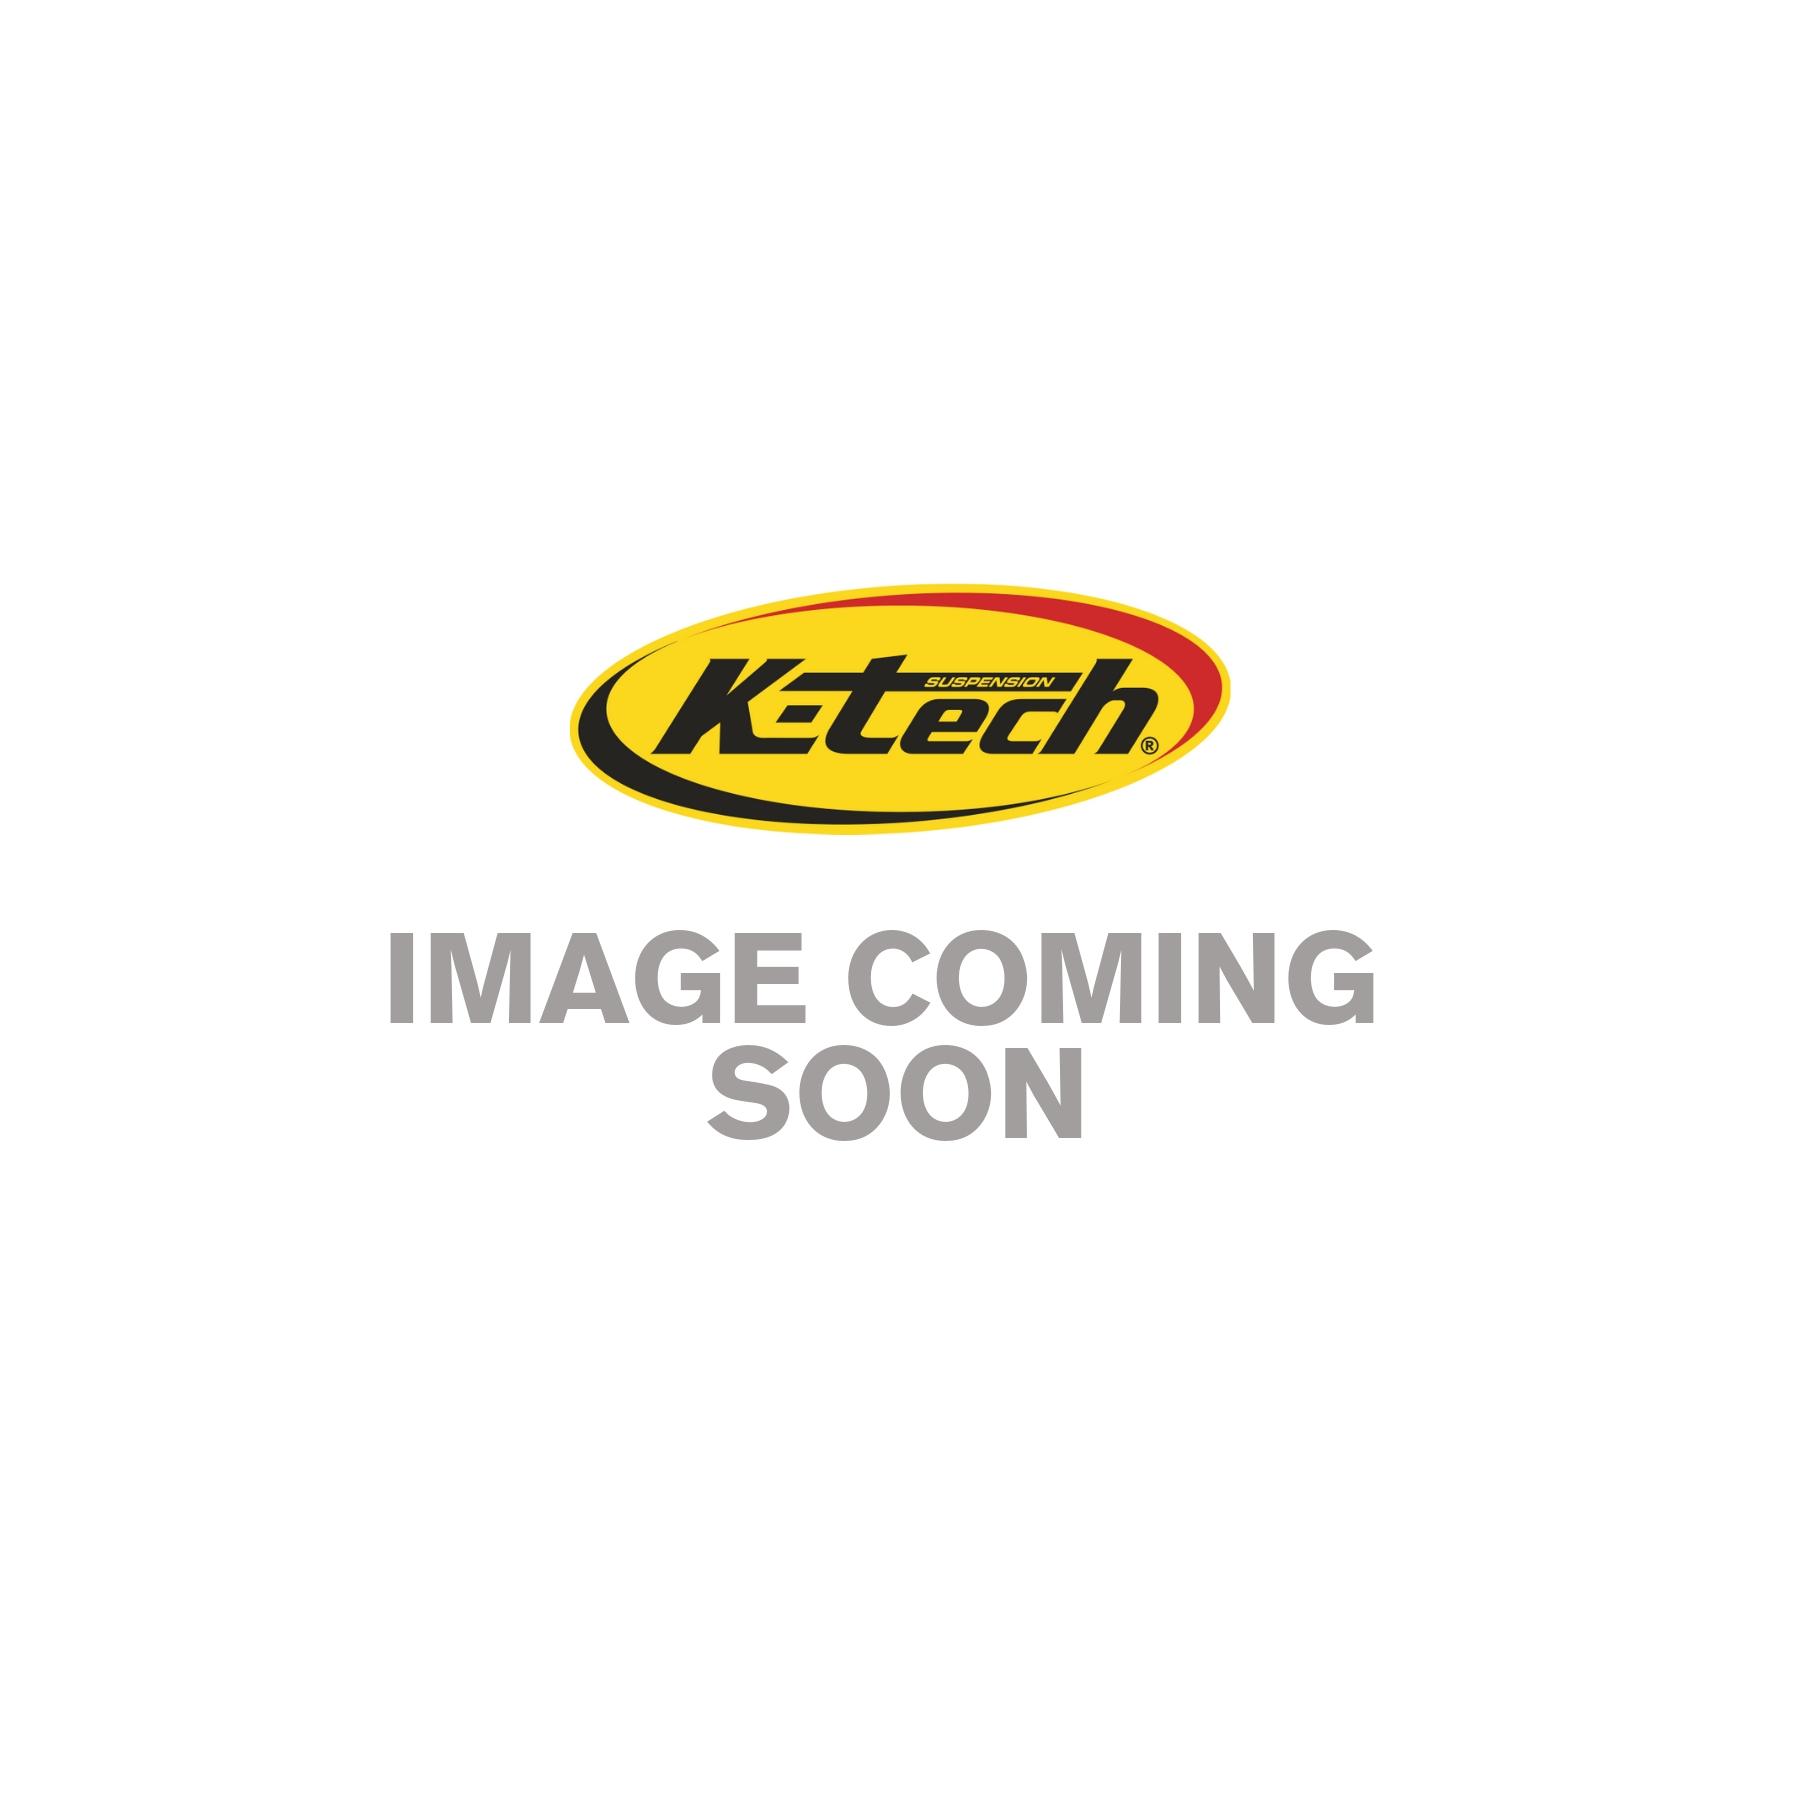 Front Fork Cartridges RDS Triumph Daytona 675 2009-2012 KYB